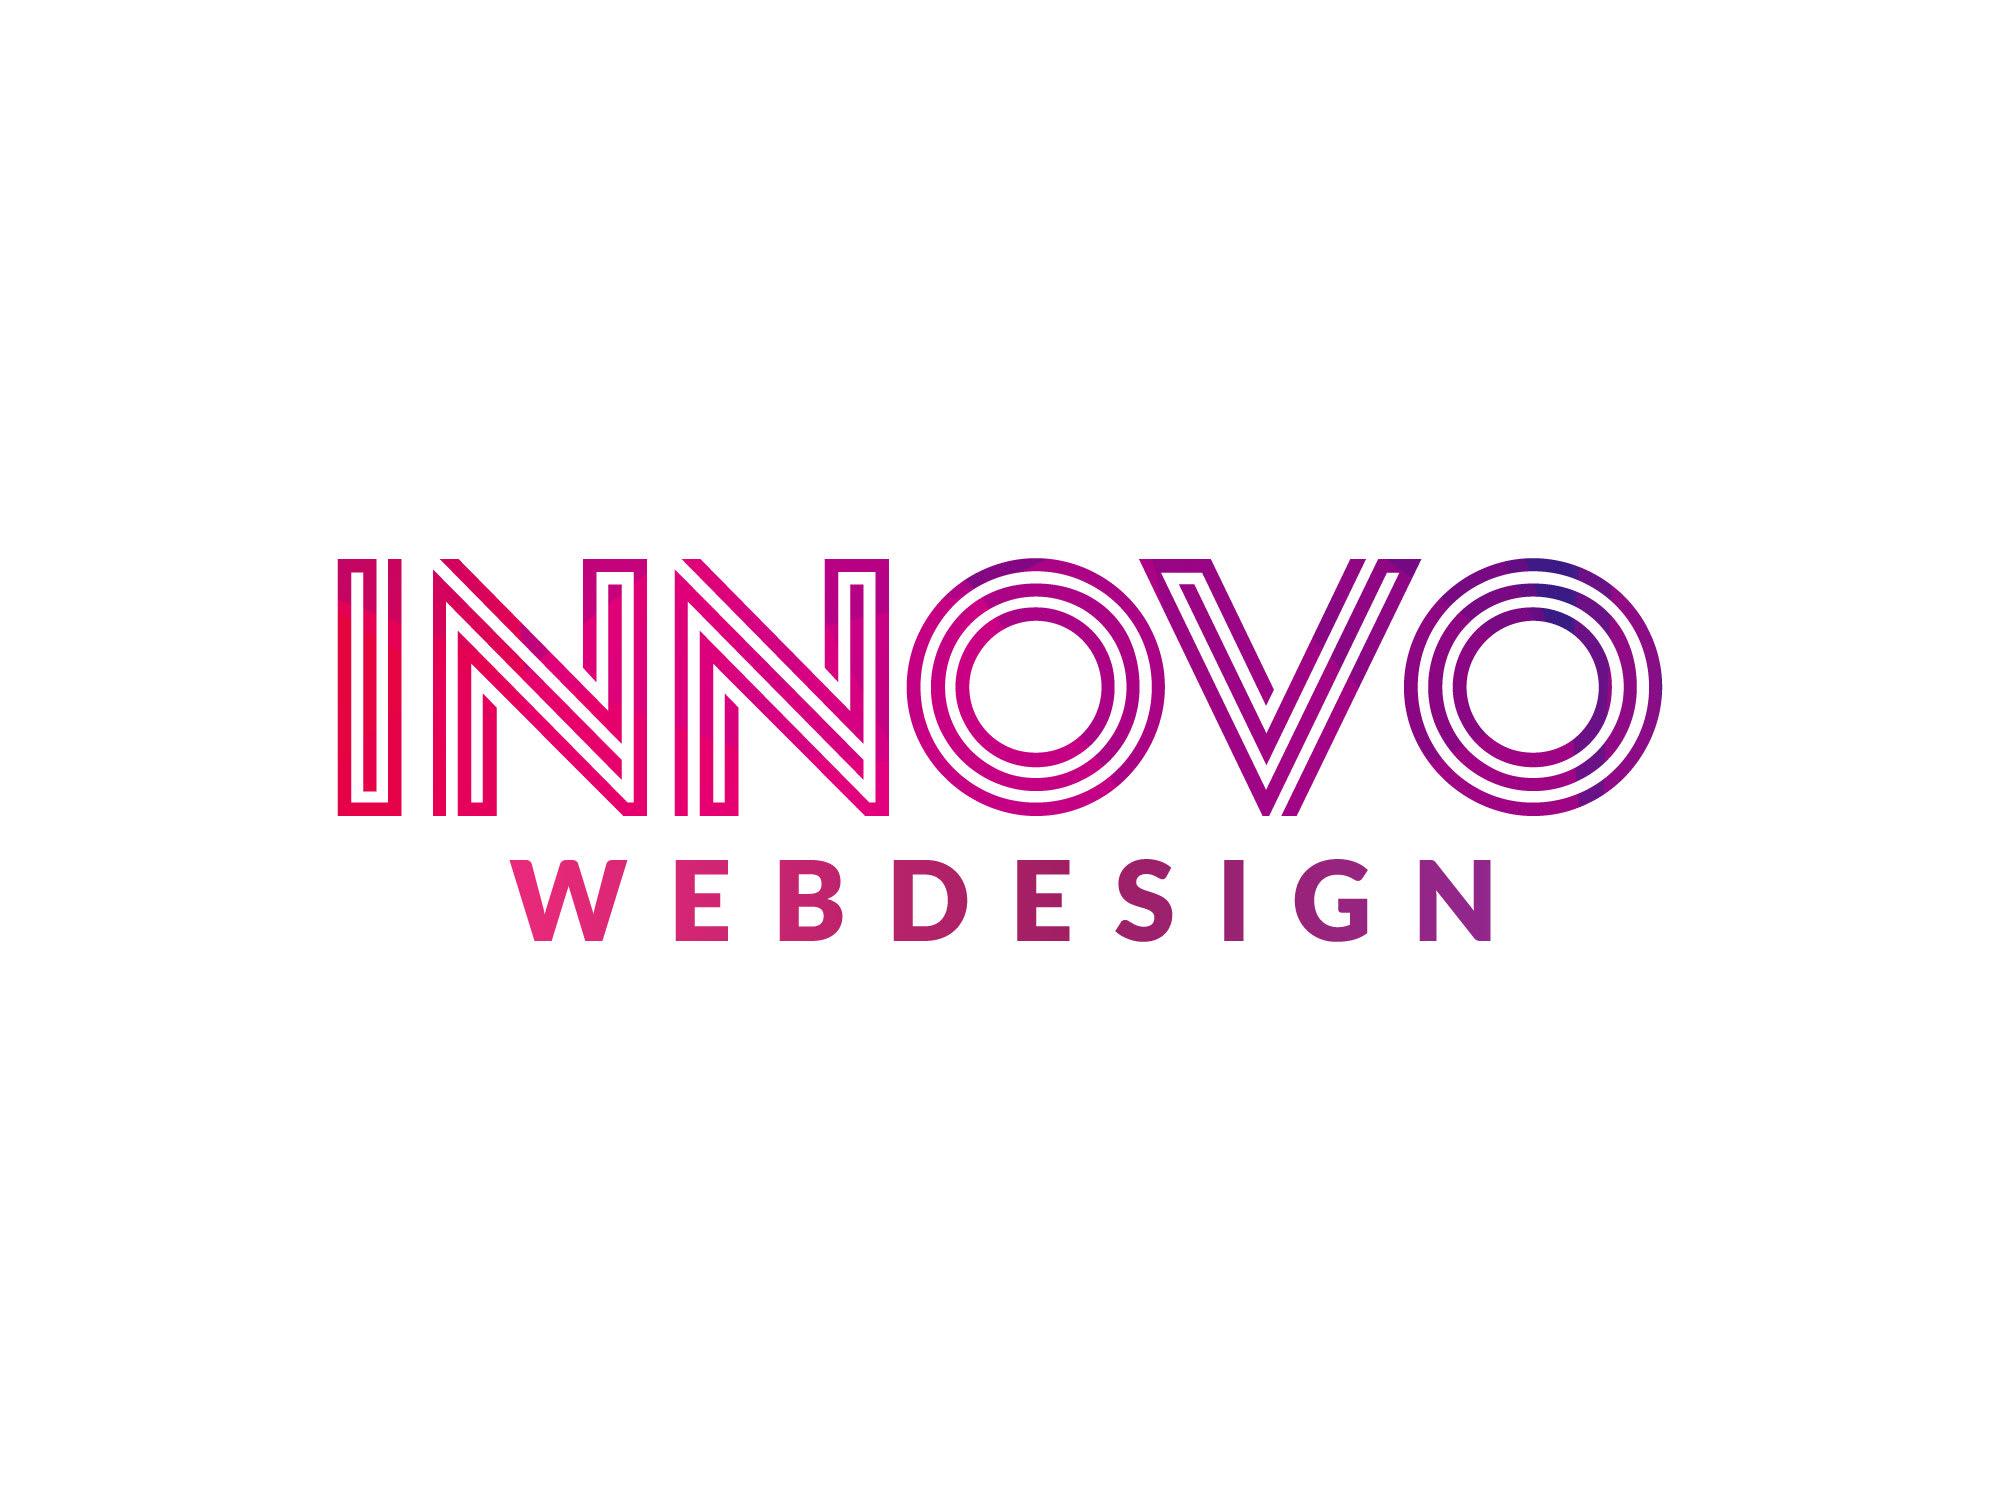 Innovo Webdesign